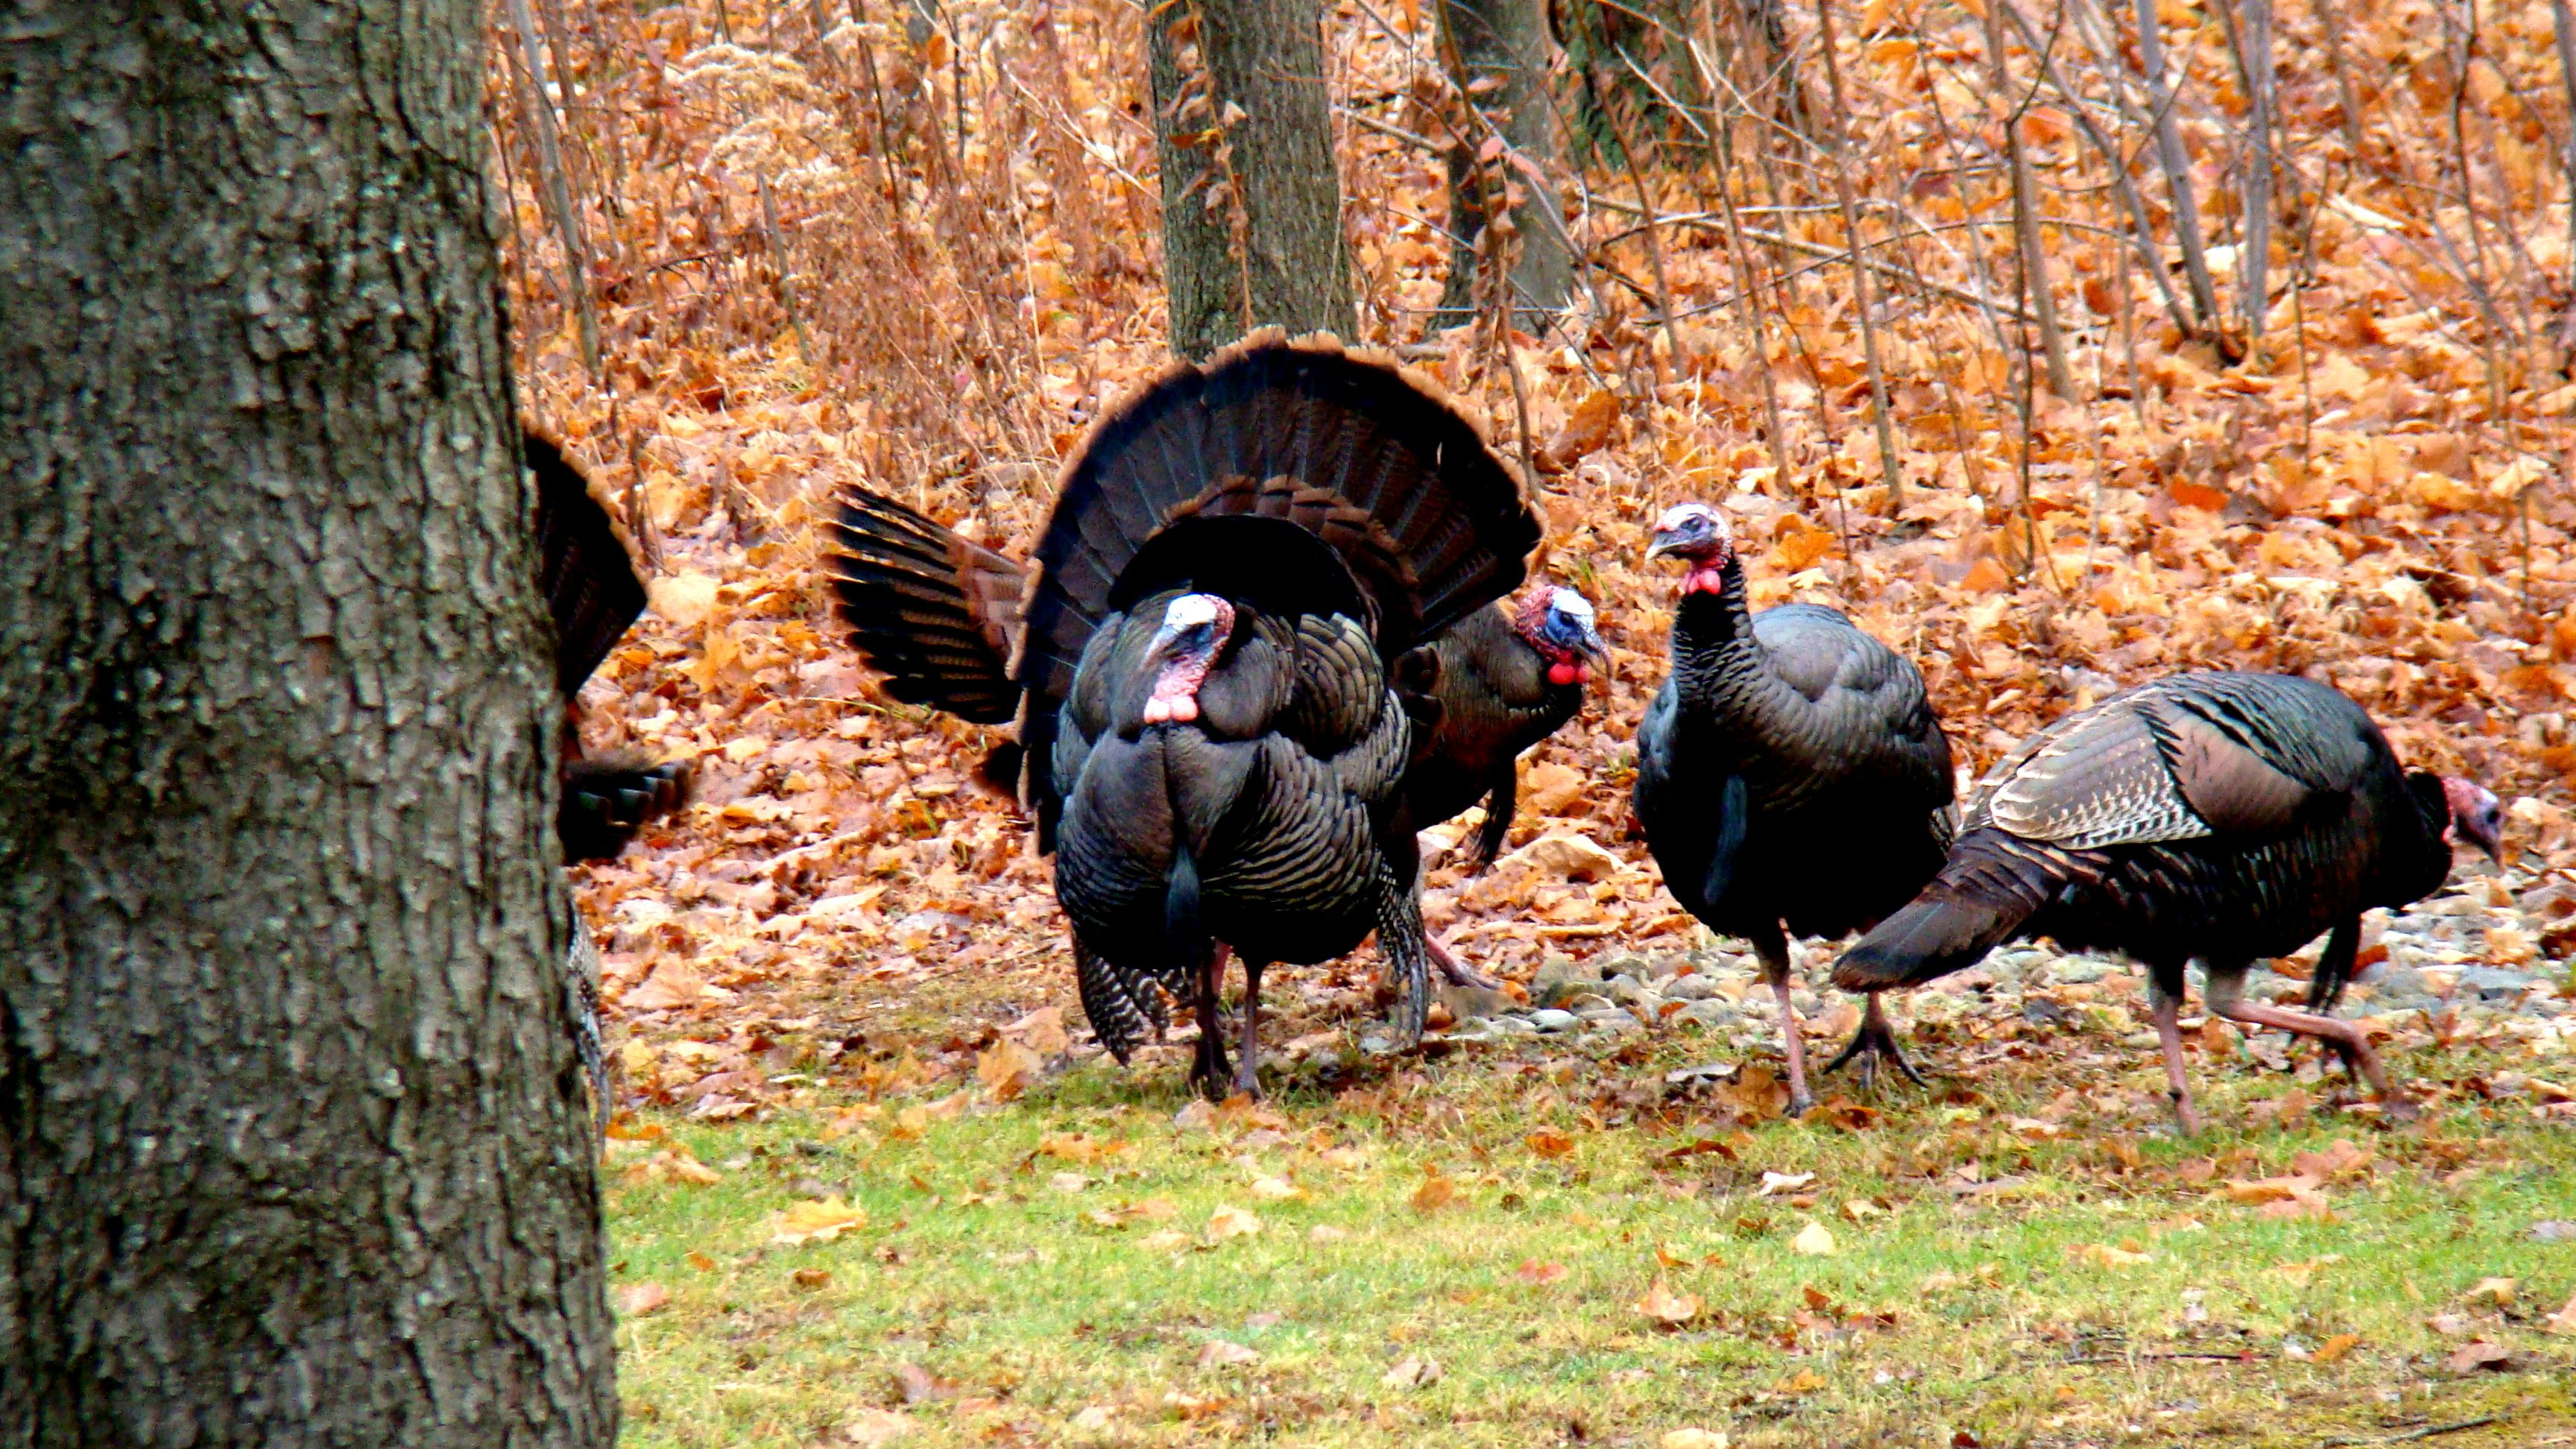 Cmon spring season turkey hunting garden